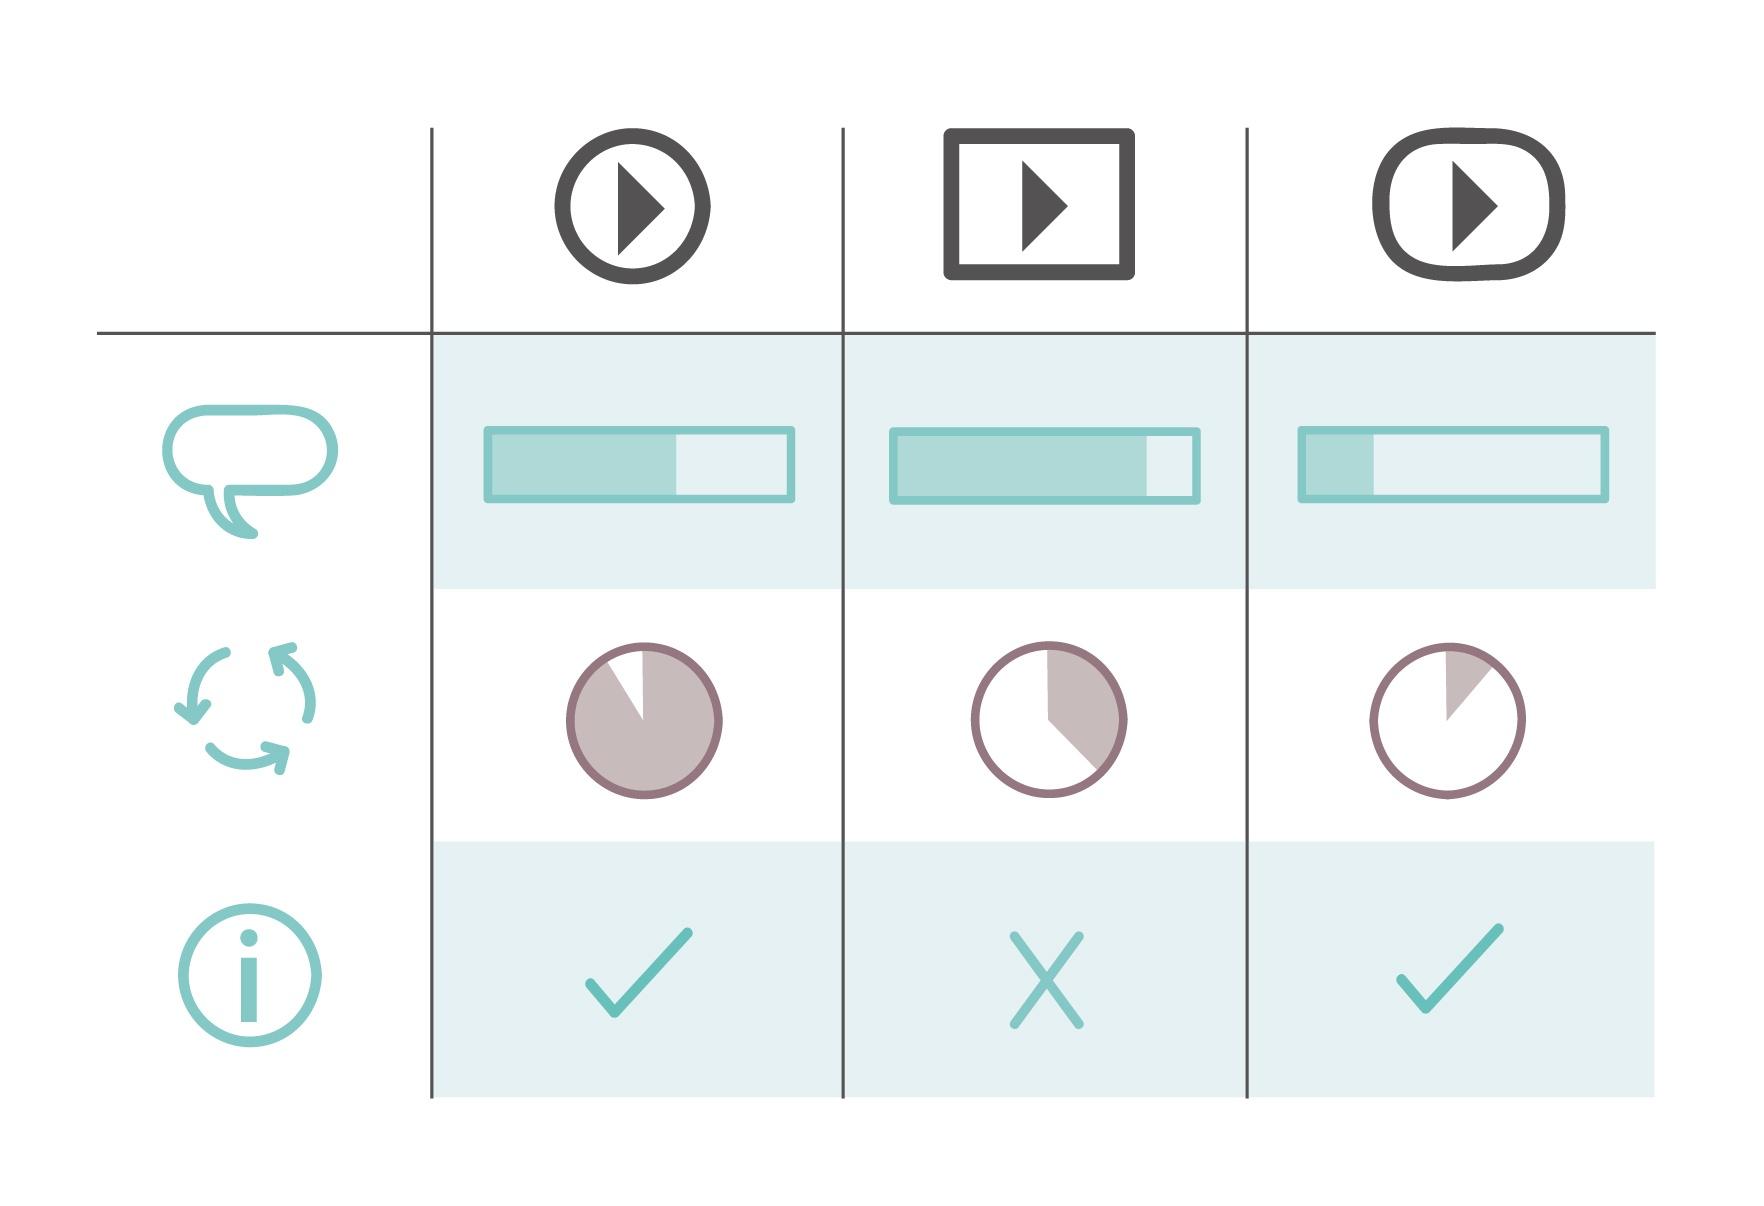 TabelleVideokanle_abstrahiert.jpg